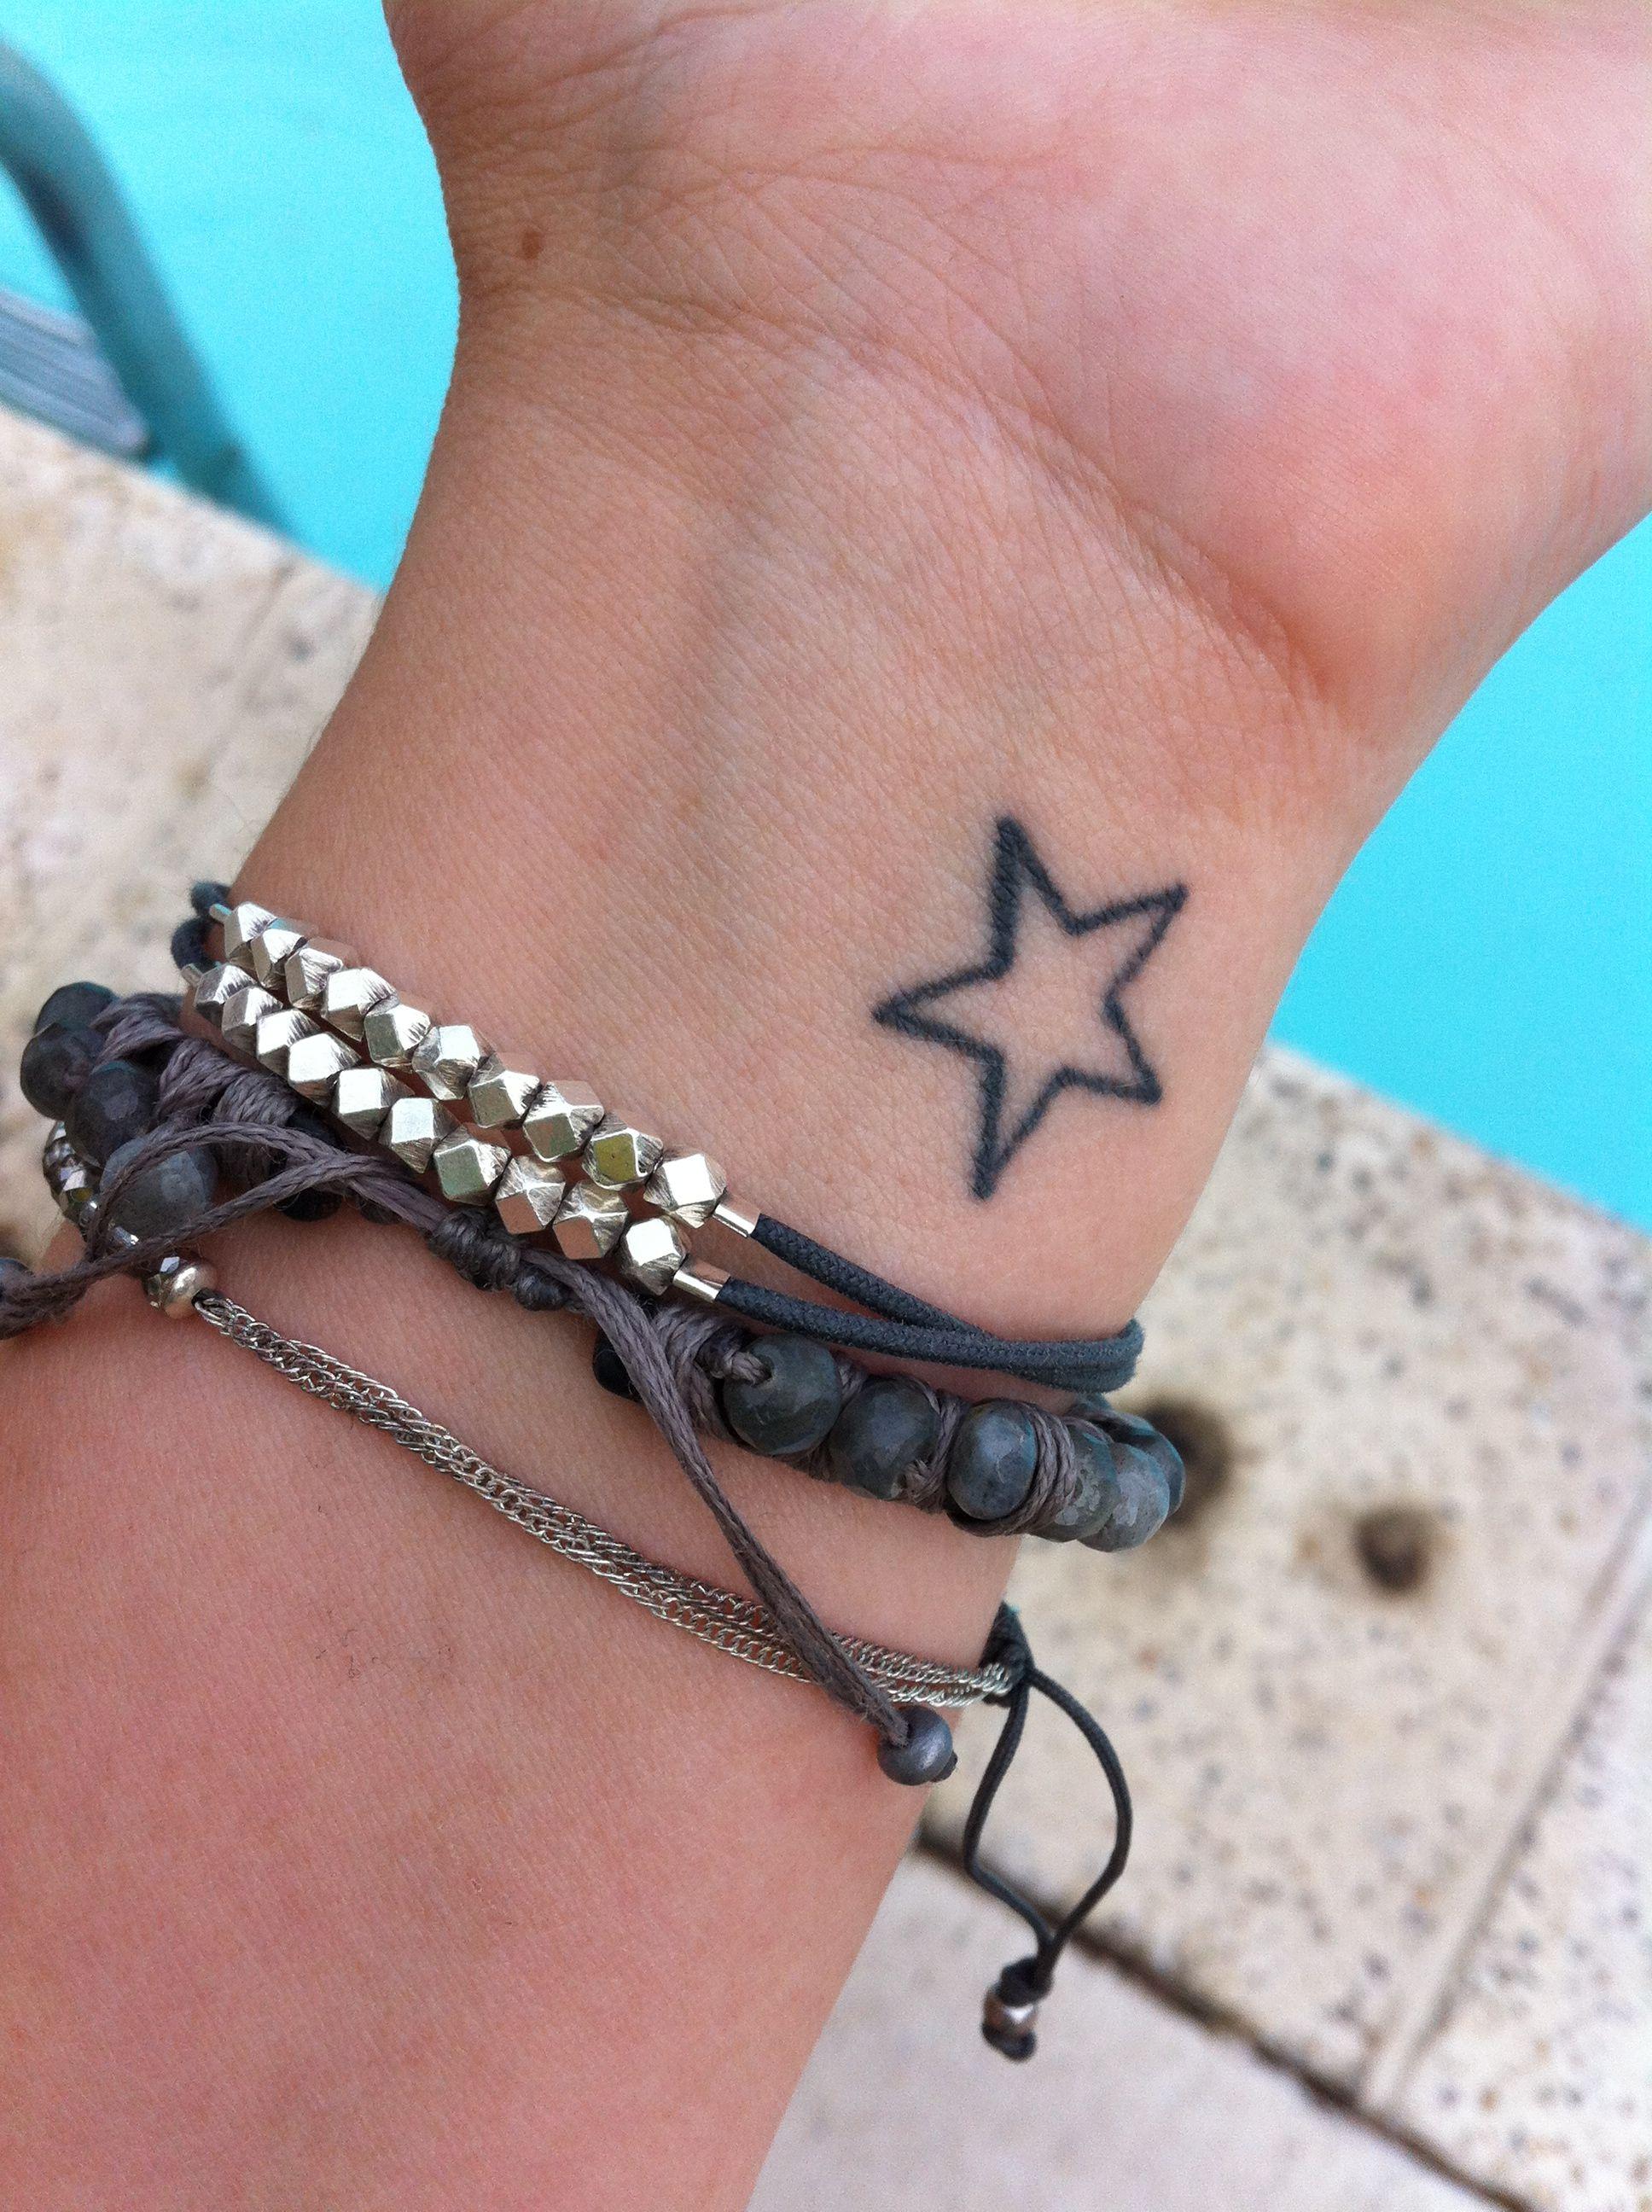 Pin on tattoos☆